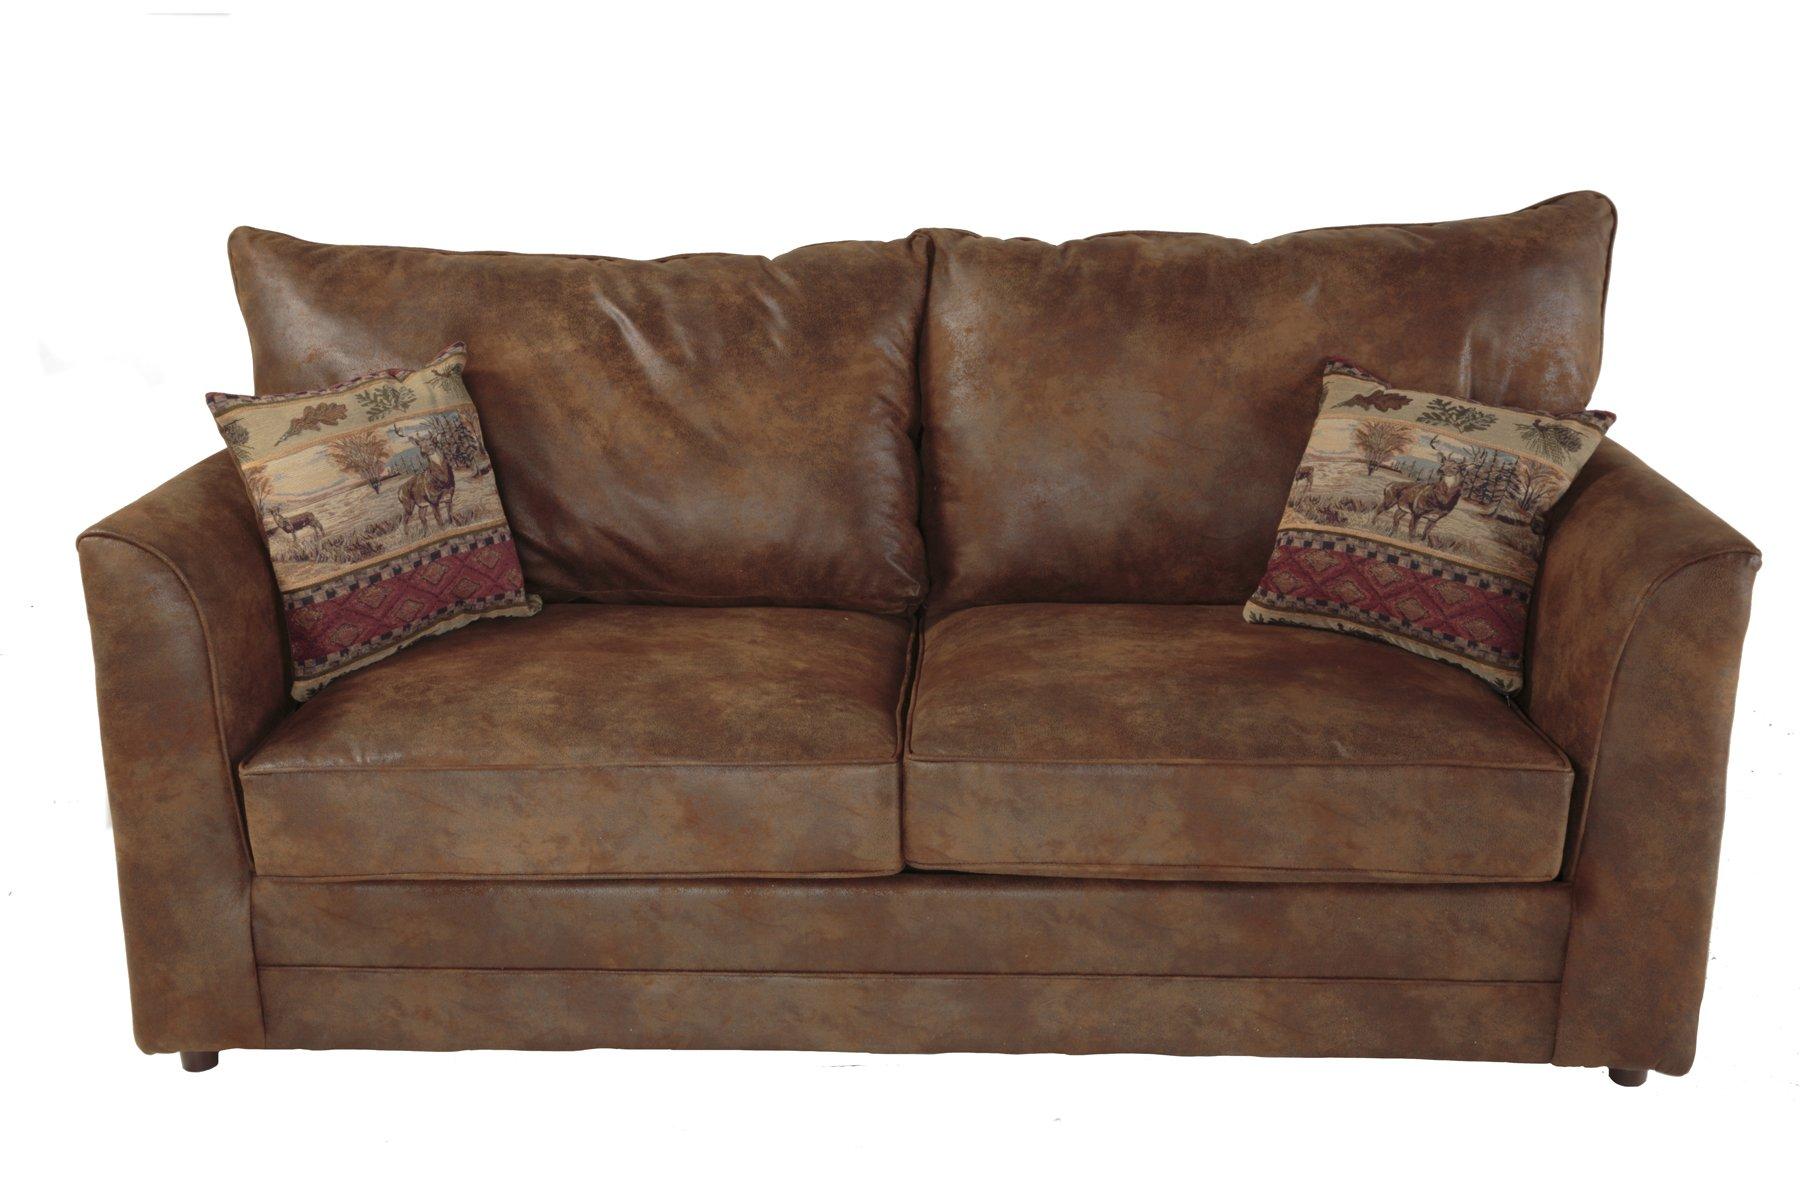 the metal is furniture wall richly with gun wardrobe classics rack wondeful box star bar of american lone hanging